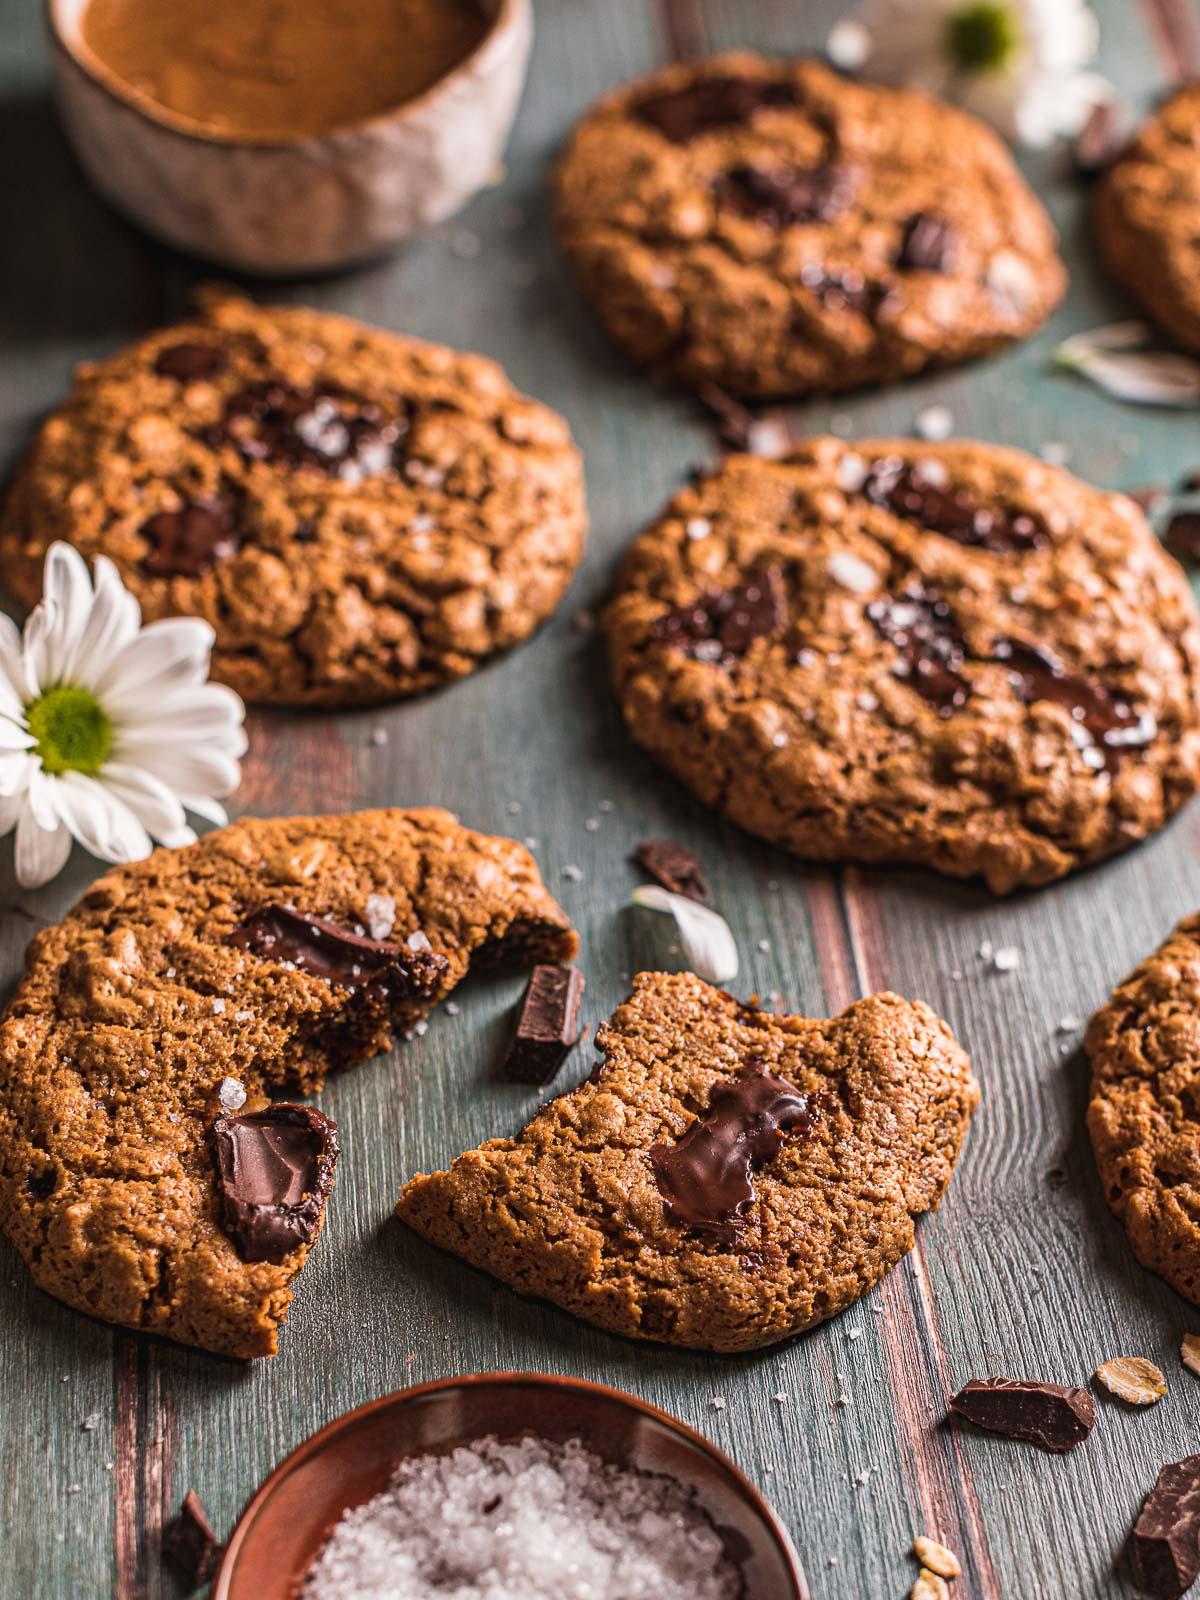 Cookies vegani senza glutine al cioccolato senza olio al burro di mandorle oil-free almond butter Gluten-free healthy Vegan Oatmeal Chocolate Chip Cookies